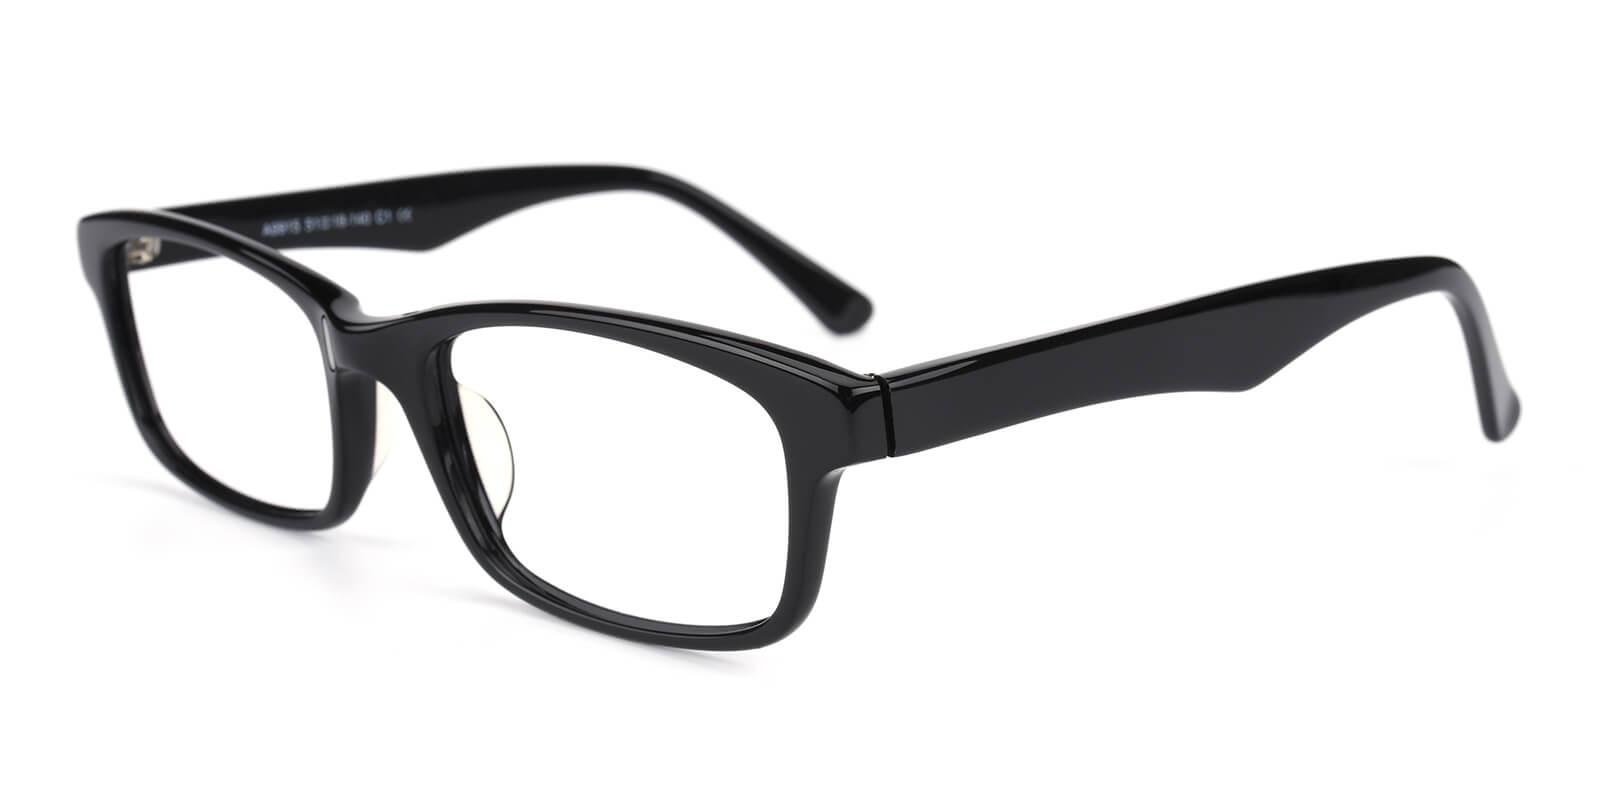 Katric-Black-Rectangle-Acetate-Eyeglasses-additional1